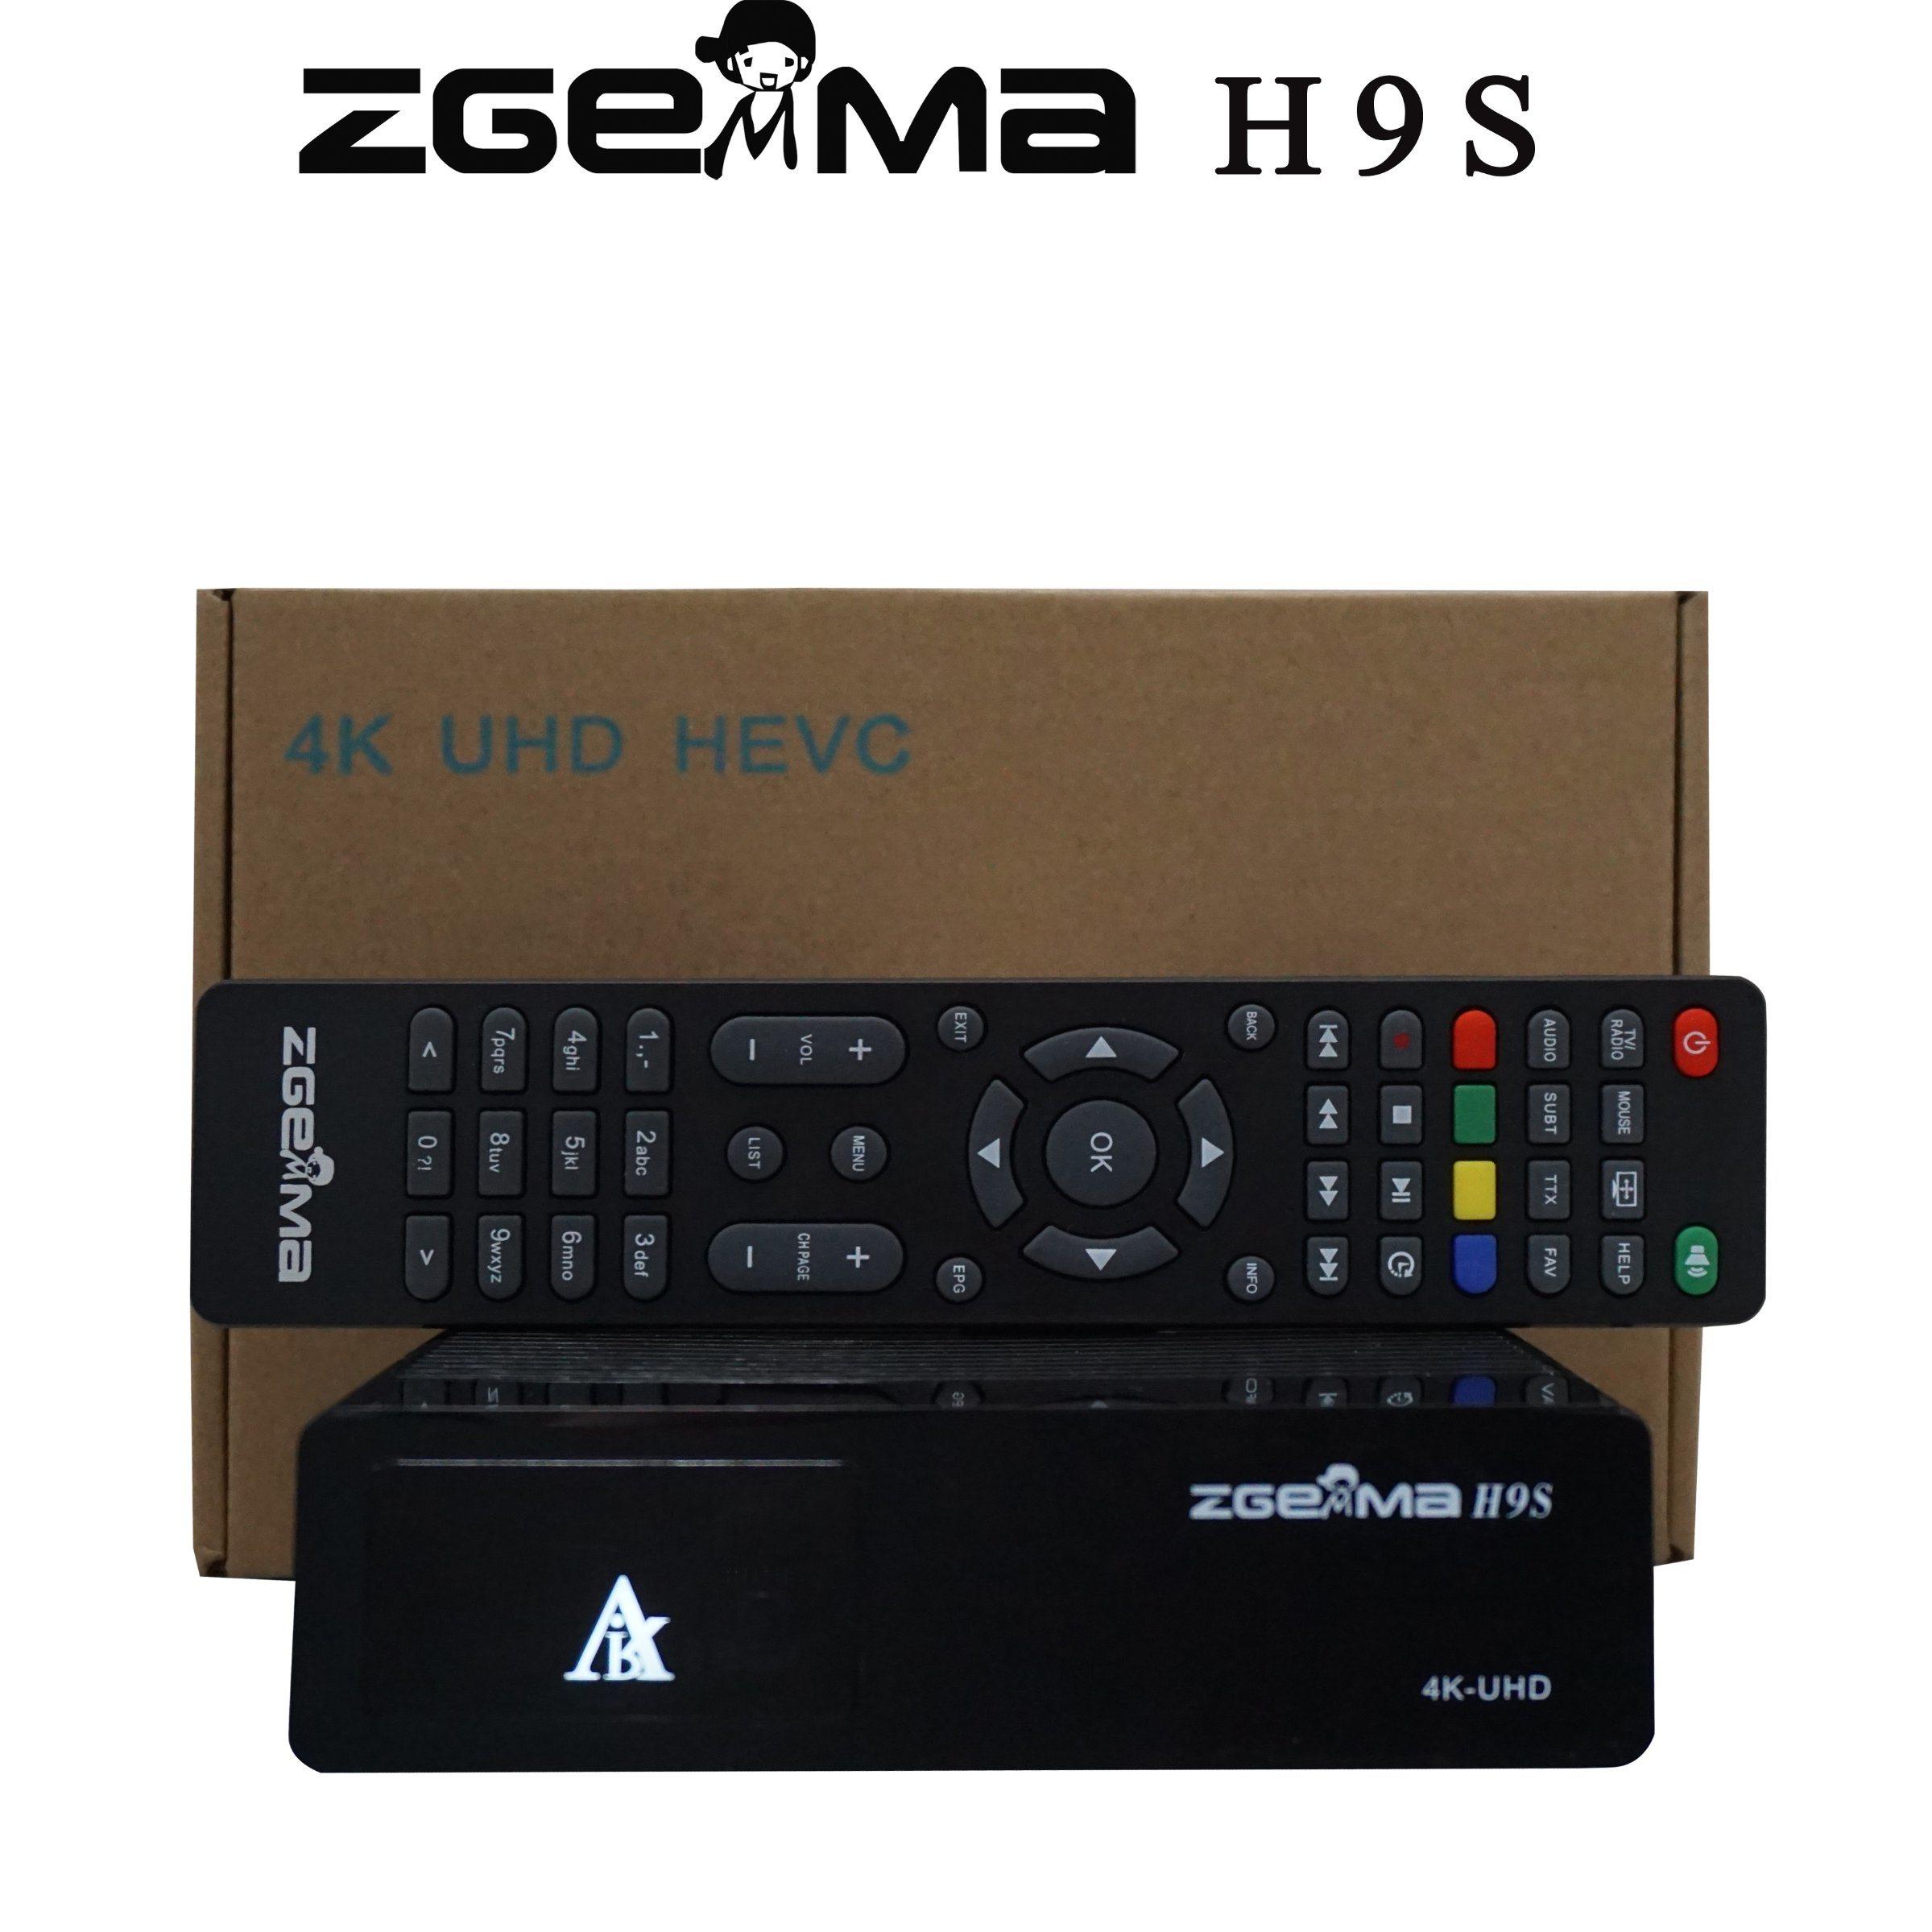 [Hot Item] Zgemma H9s with DVB-S2X 4K UHD Satellite Receiver IPTV Stalker